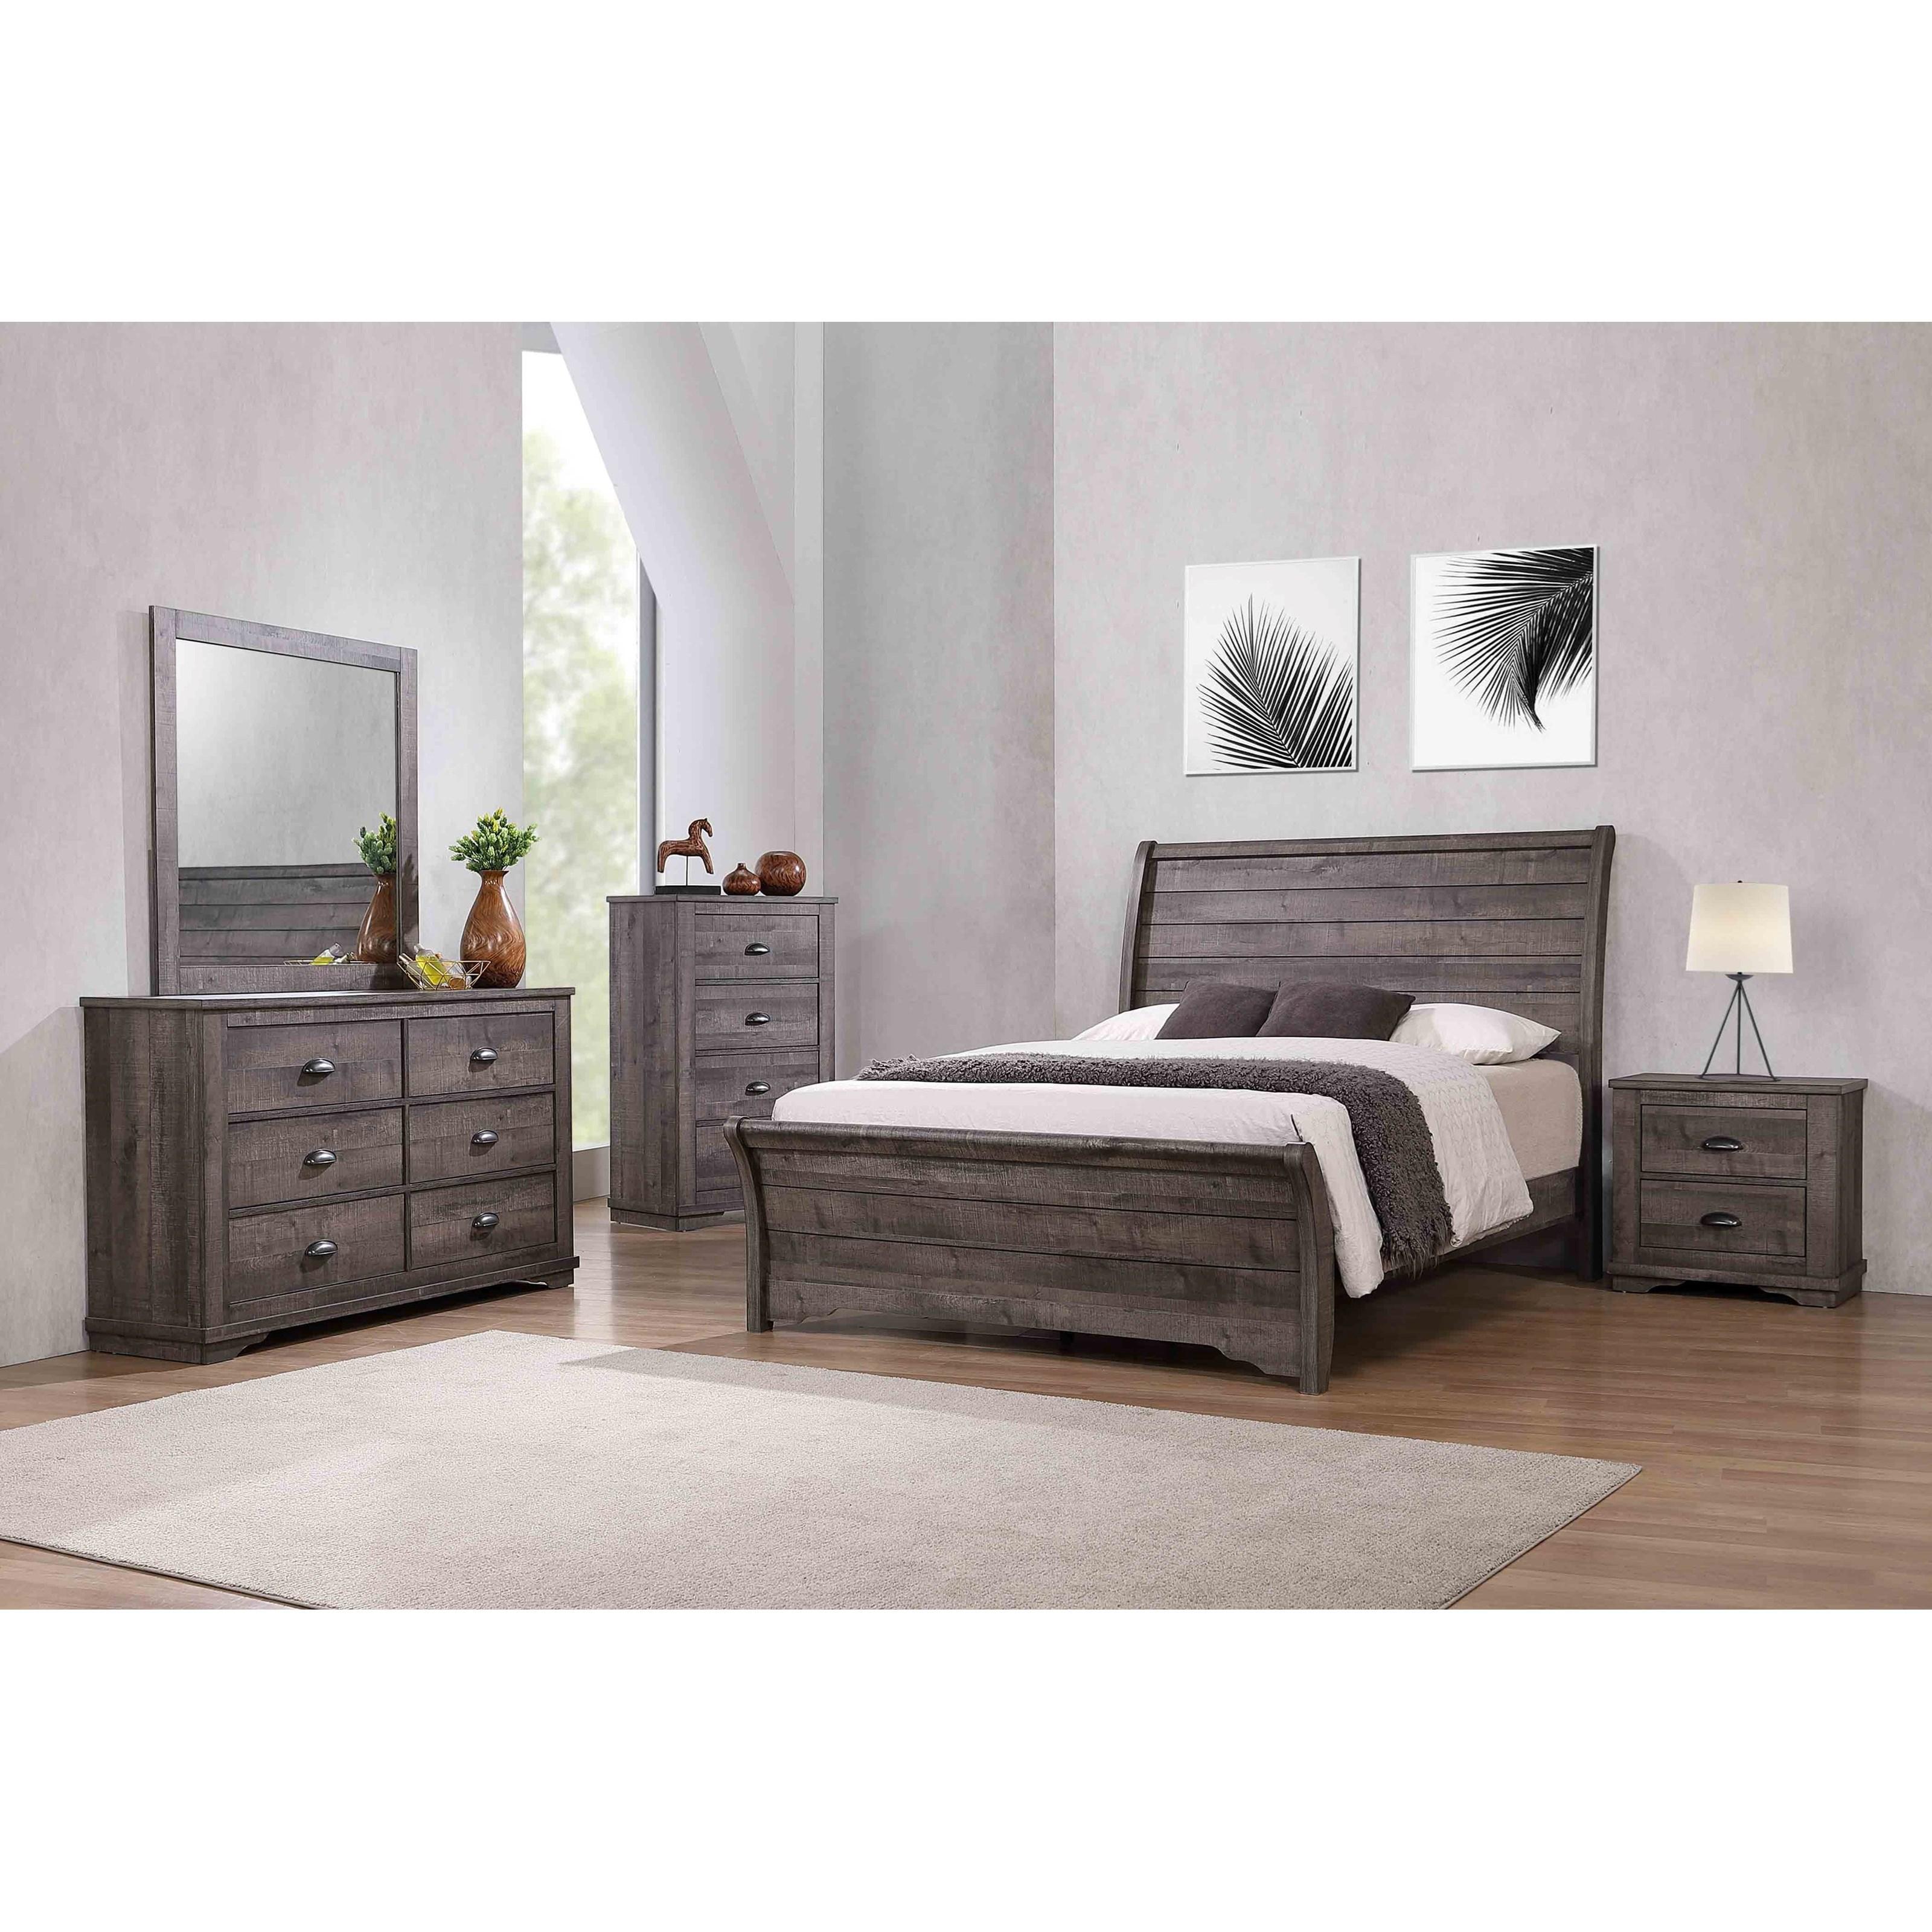 Caroline 5PC Queen Bedroom Set at Rotmans